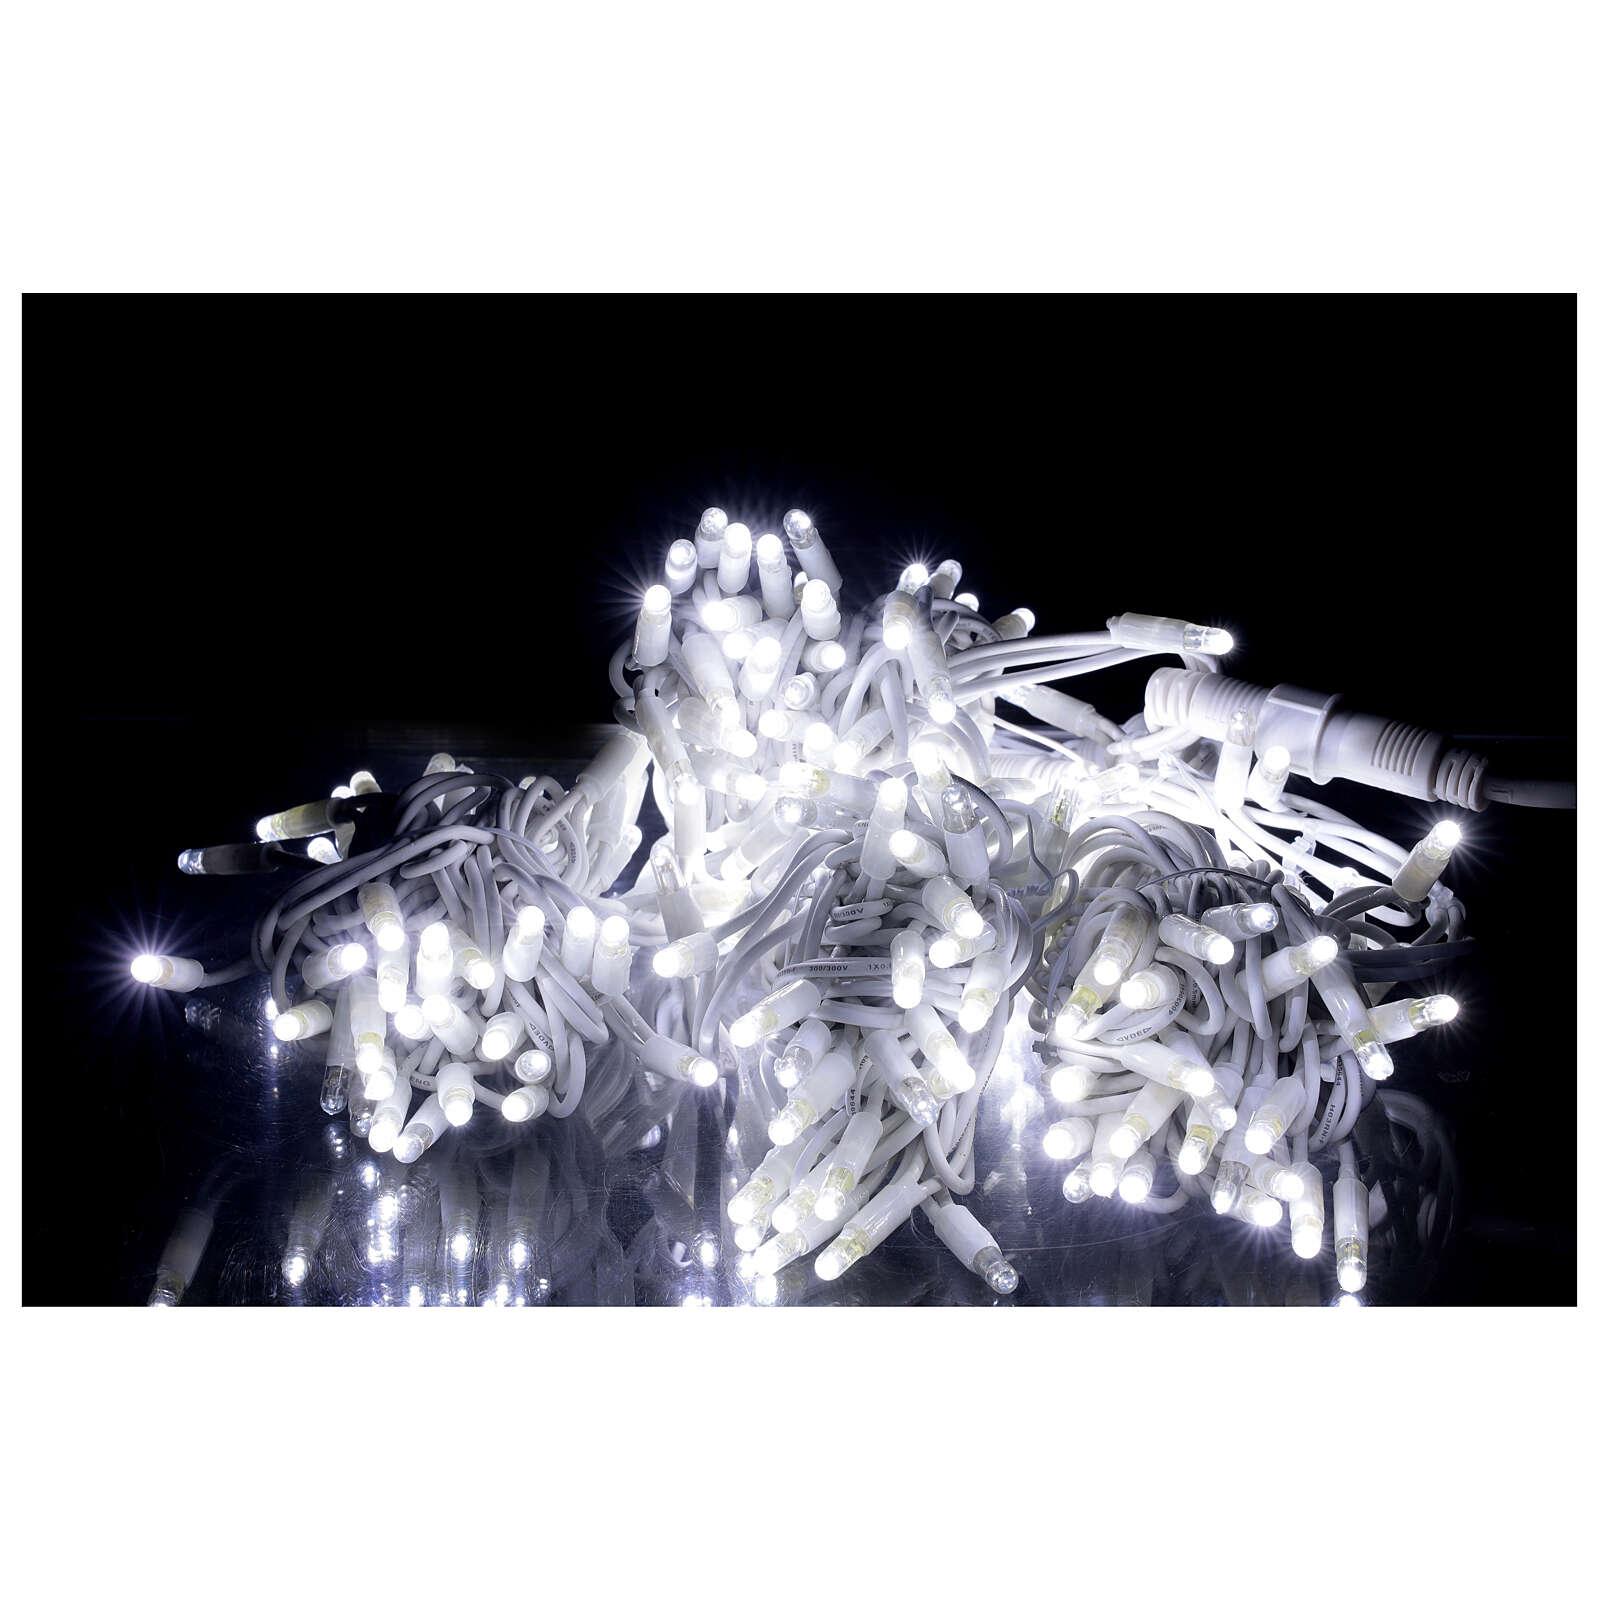 Catena 200 led ultraluminosi bianchi 40 ministrobo 20 mt int est corrente 3